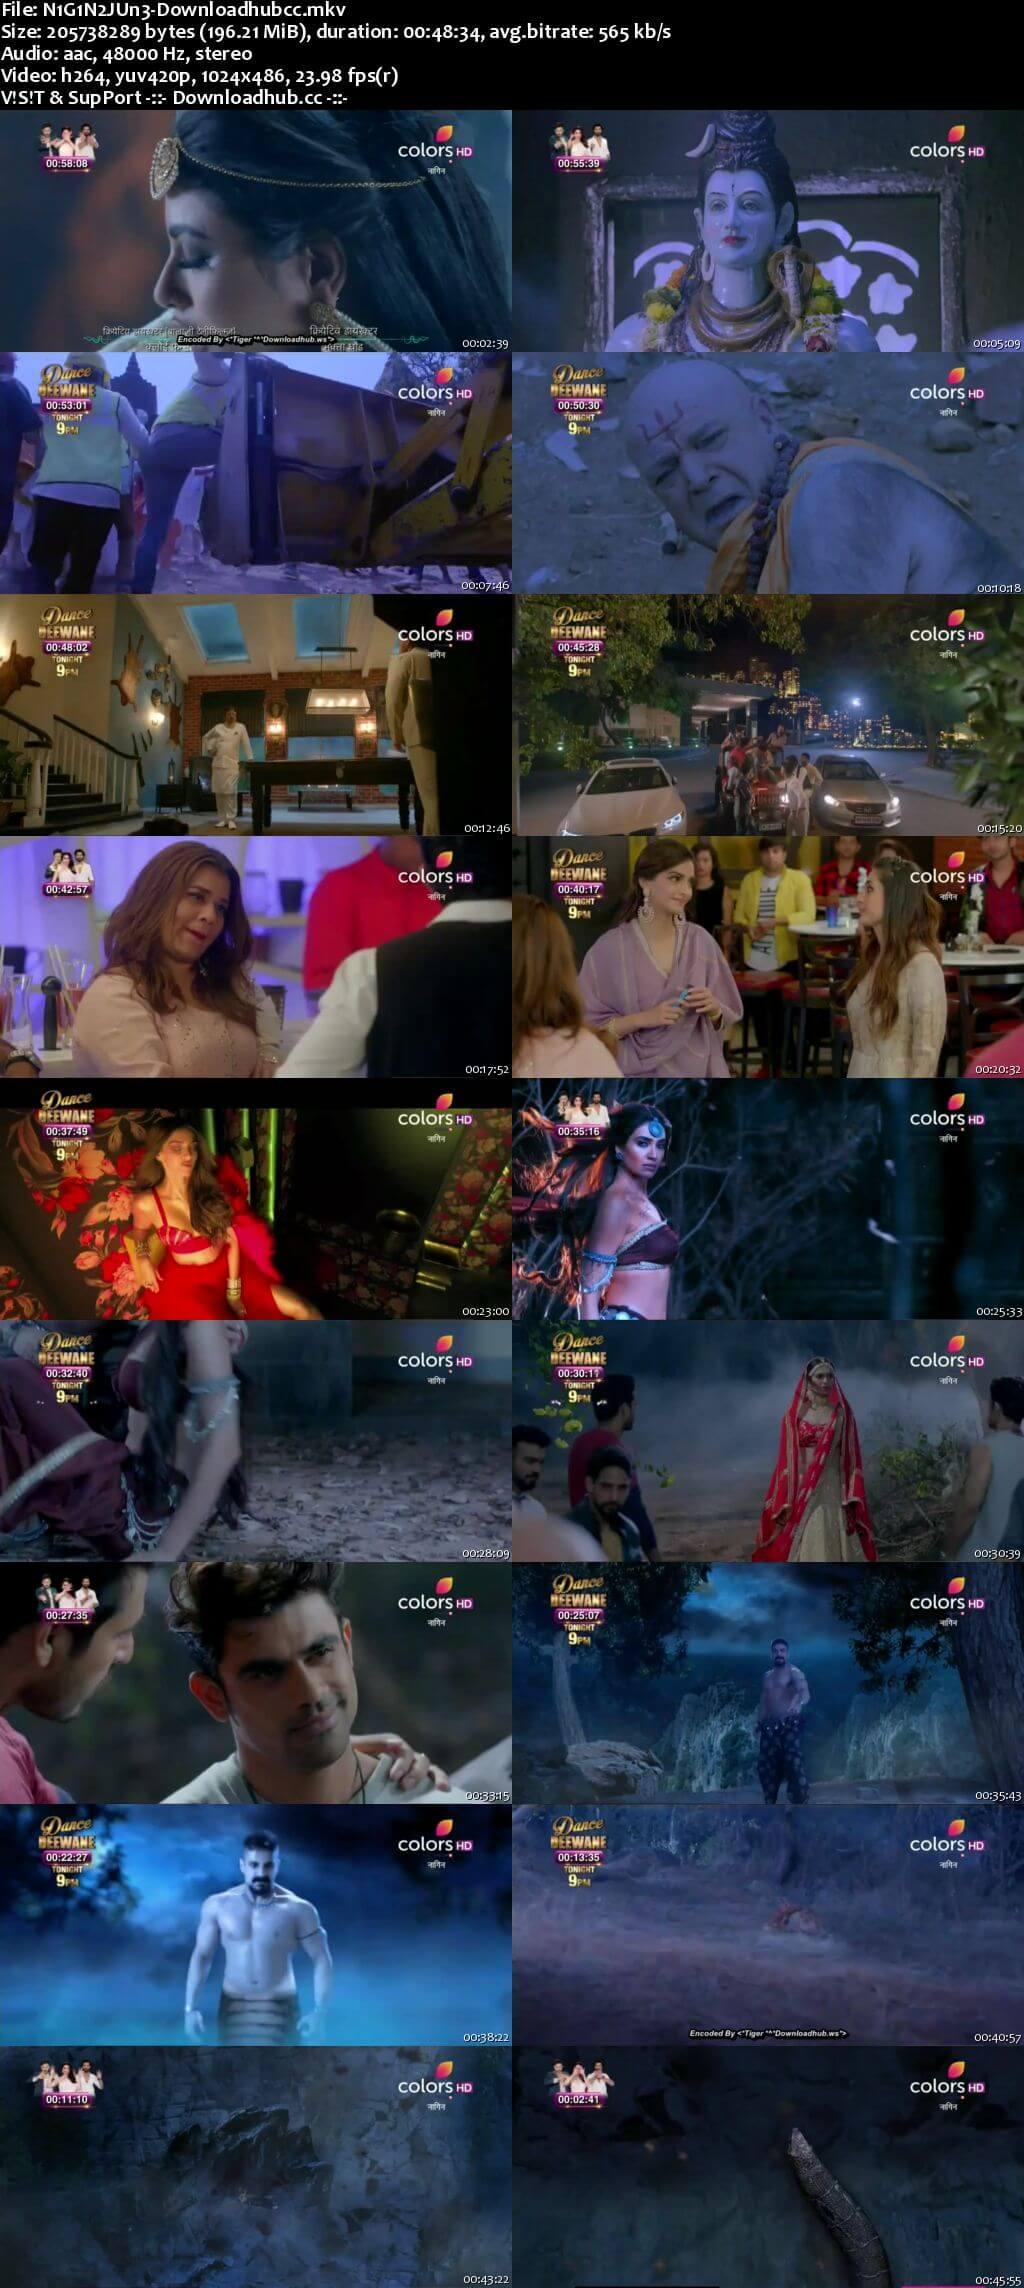 Naagin Season 3 04 June 2018 Episode 01 HDTV 480p